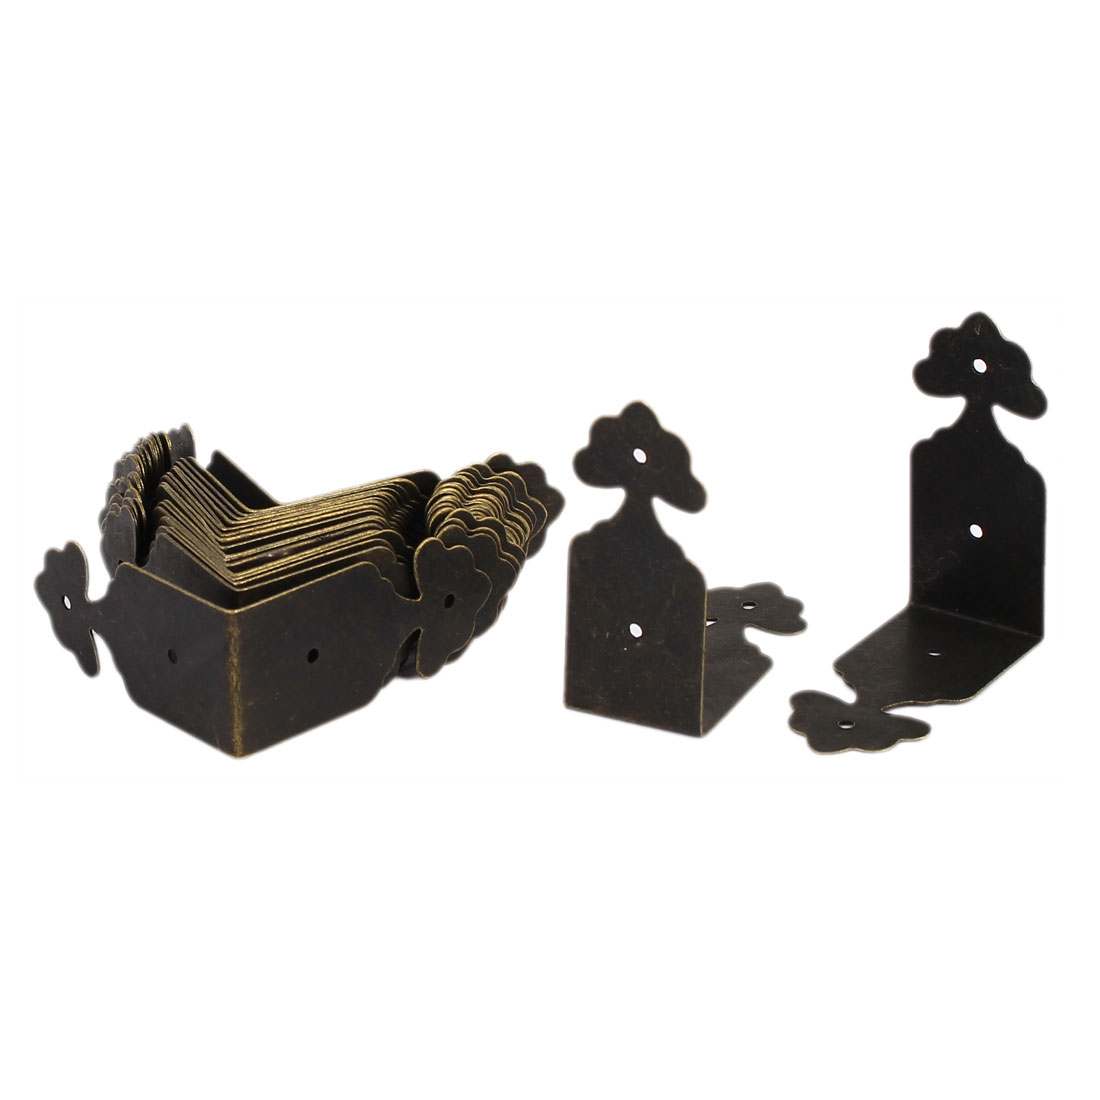 Table Chest Gift Box Desk Edge Cover Corner Protector 39mm x 18mm 20PCS